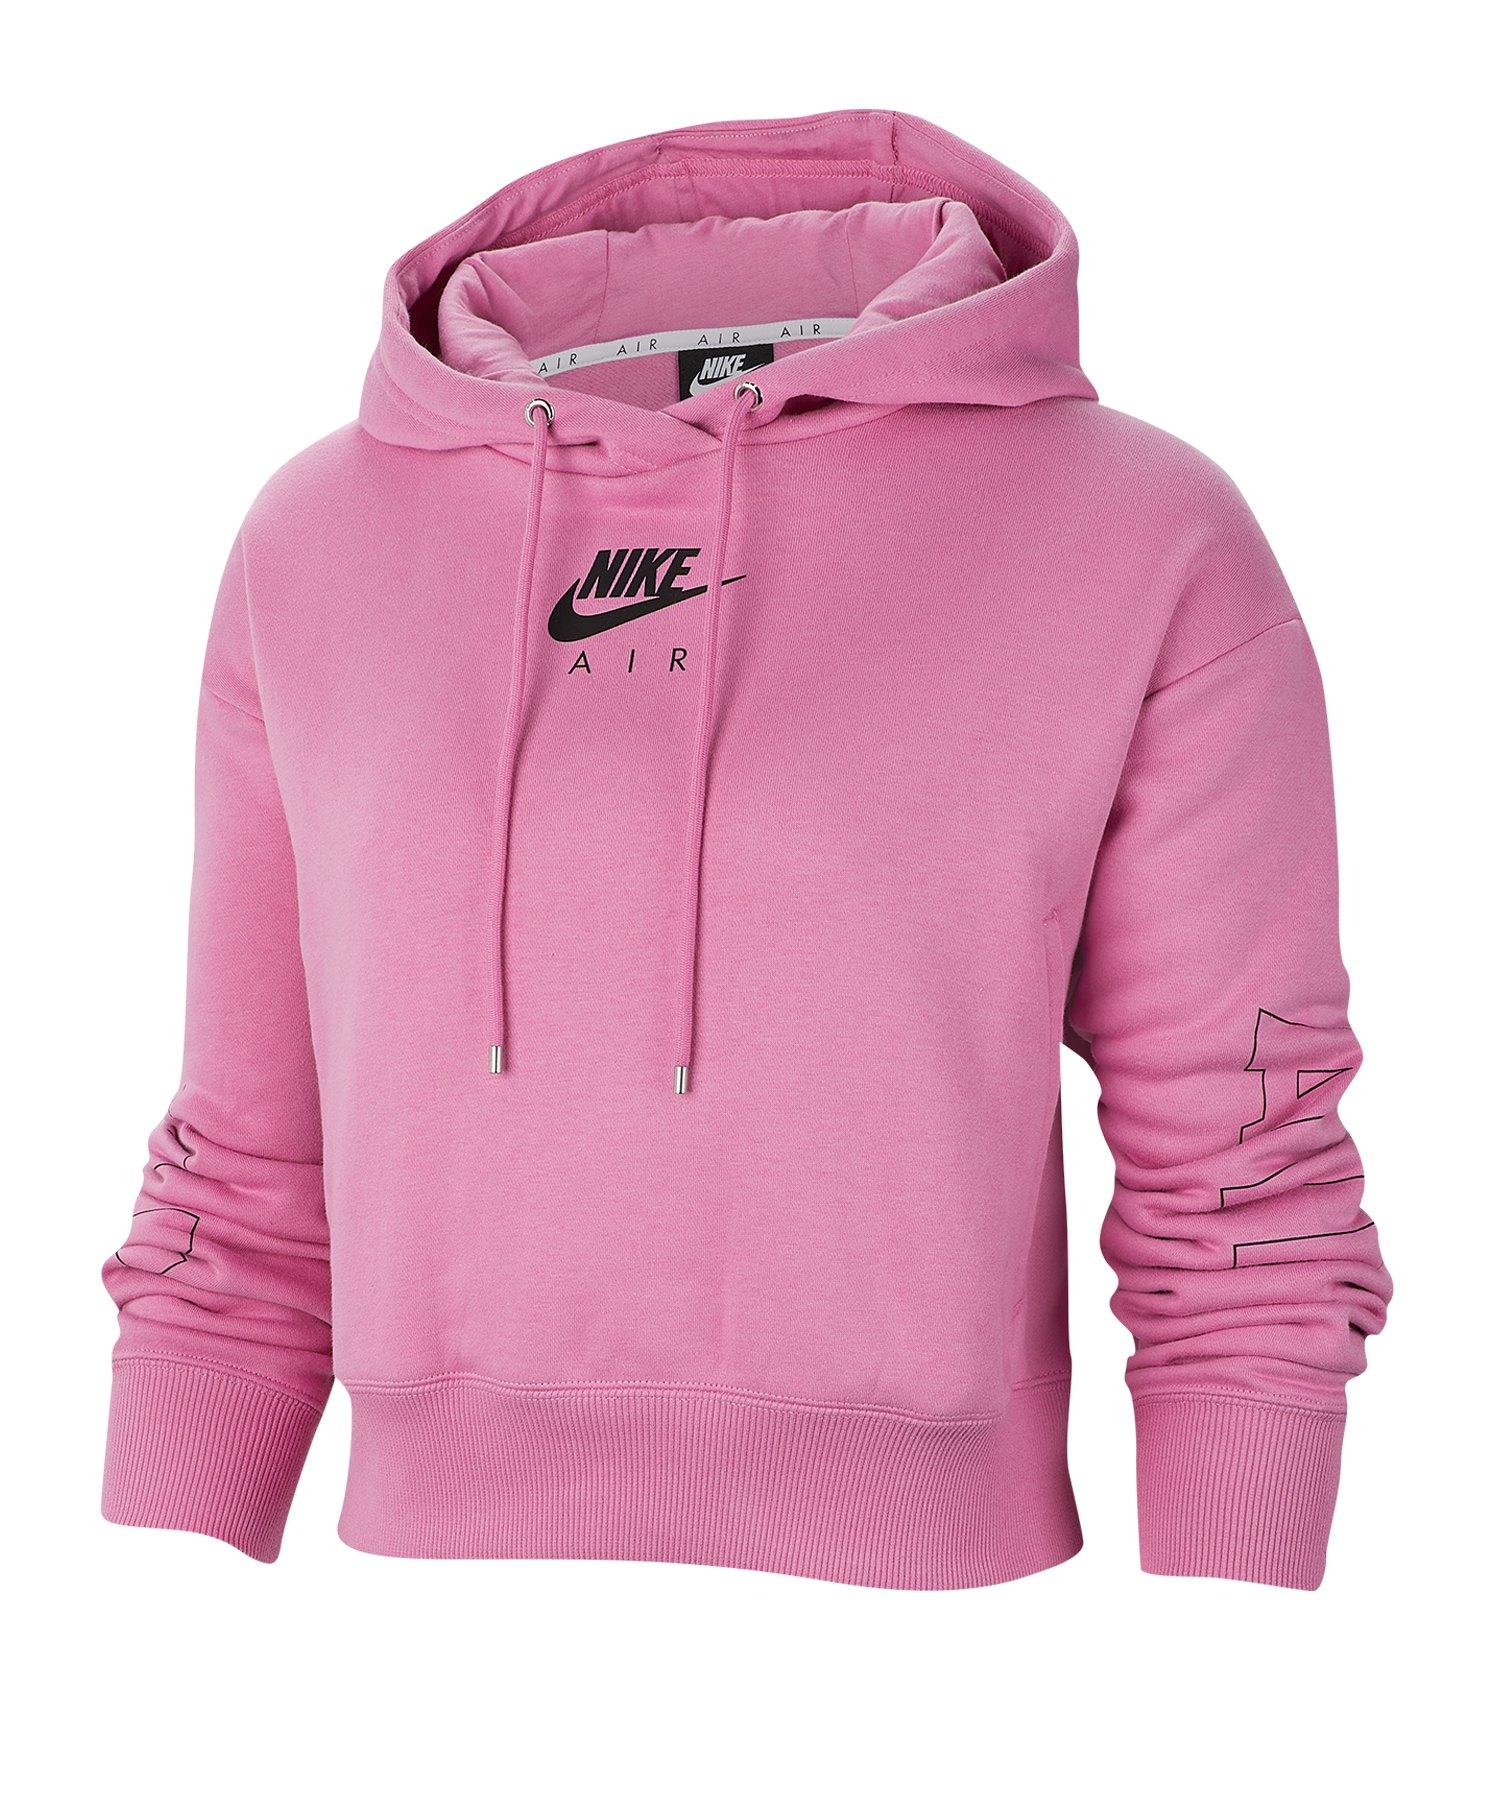 Nike Air Fleece Hoody Kapuzenpullover Damen F693 - rot